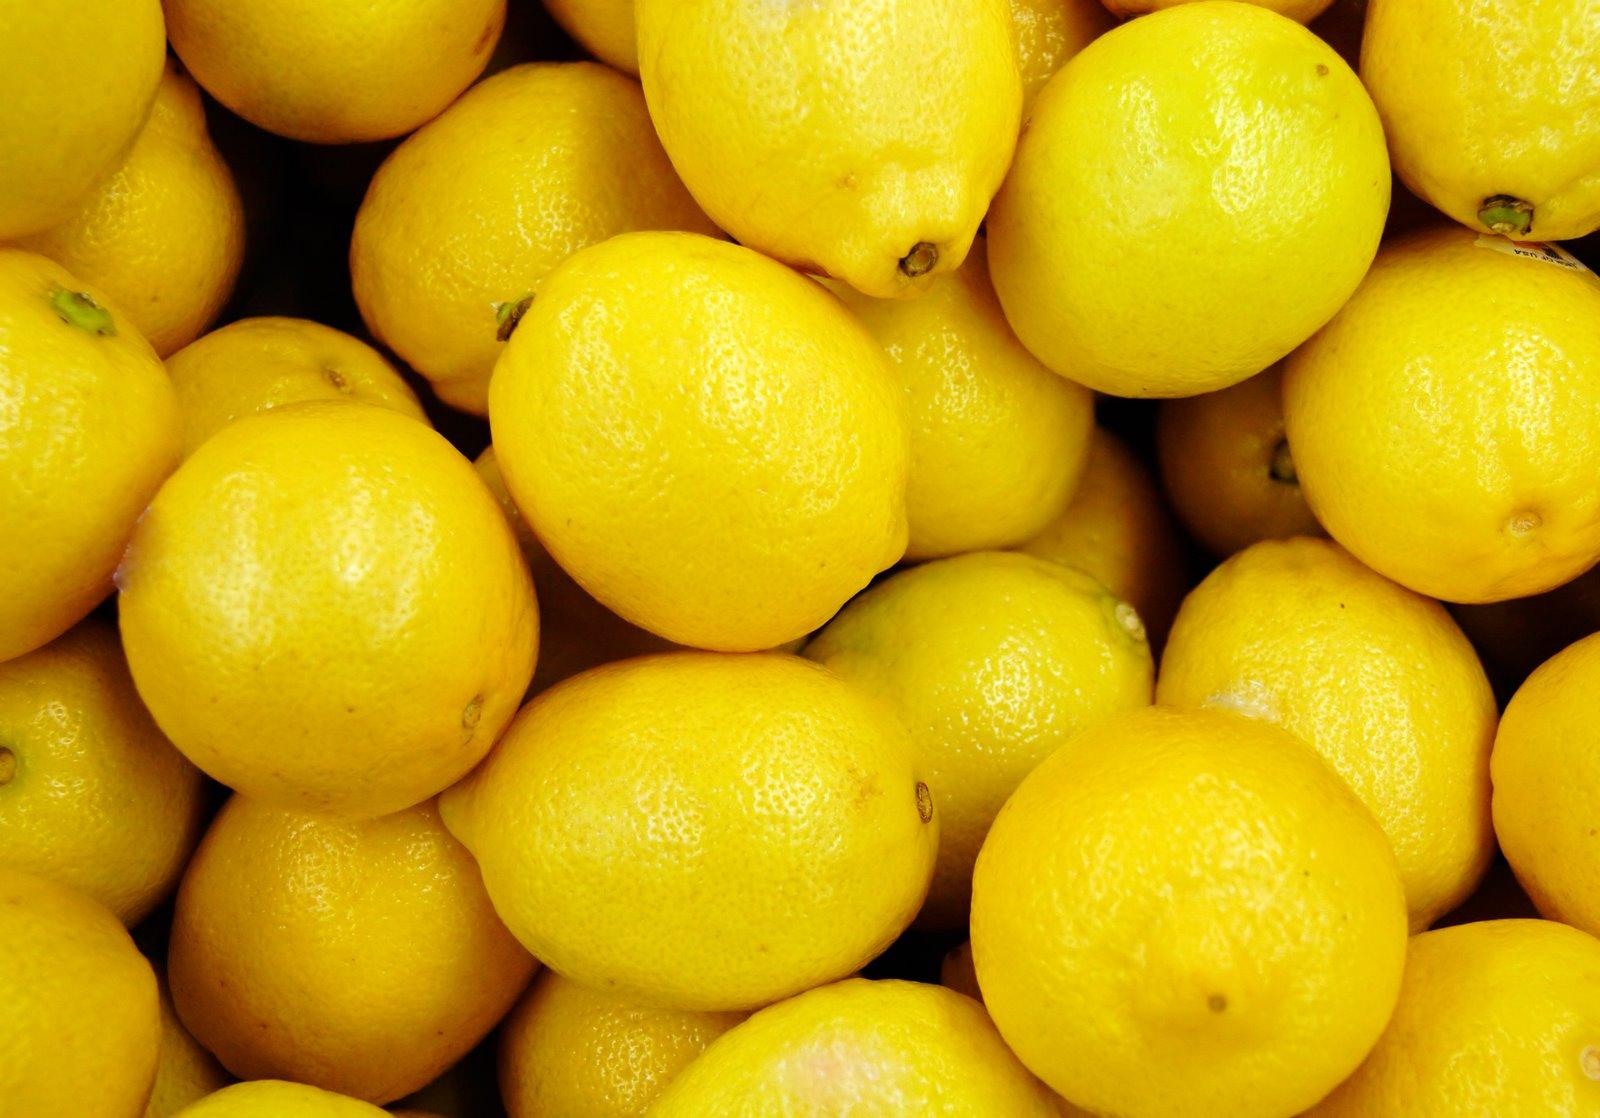 Lemons benefiting your health - FOX29 Lake Charles